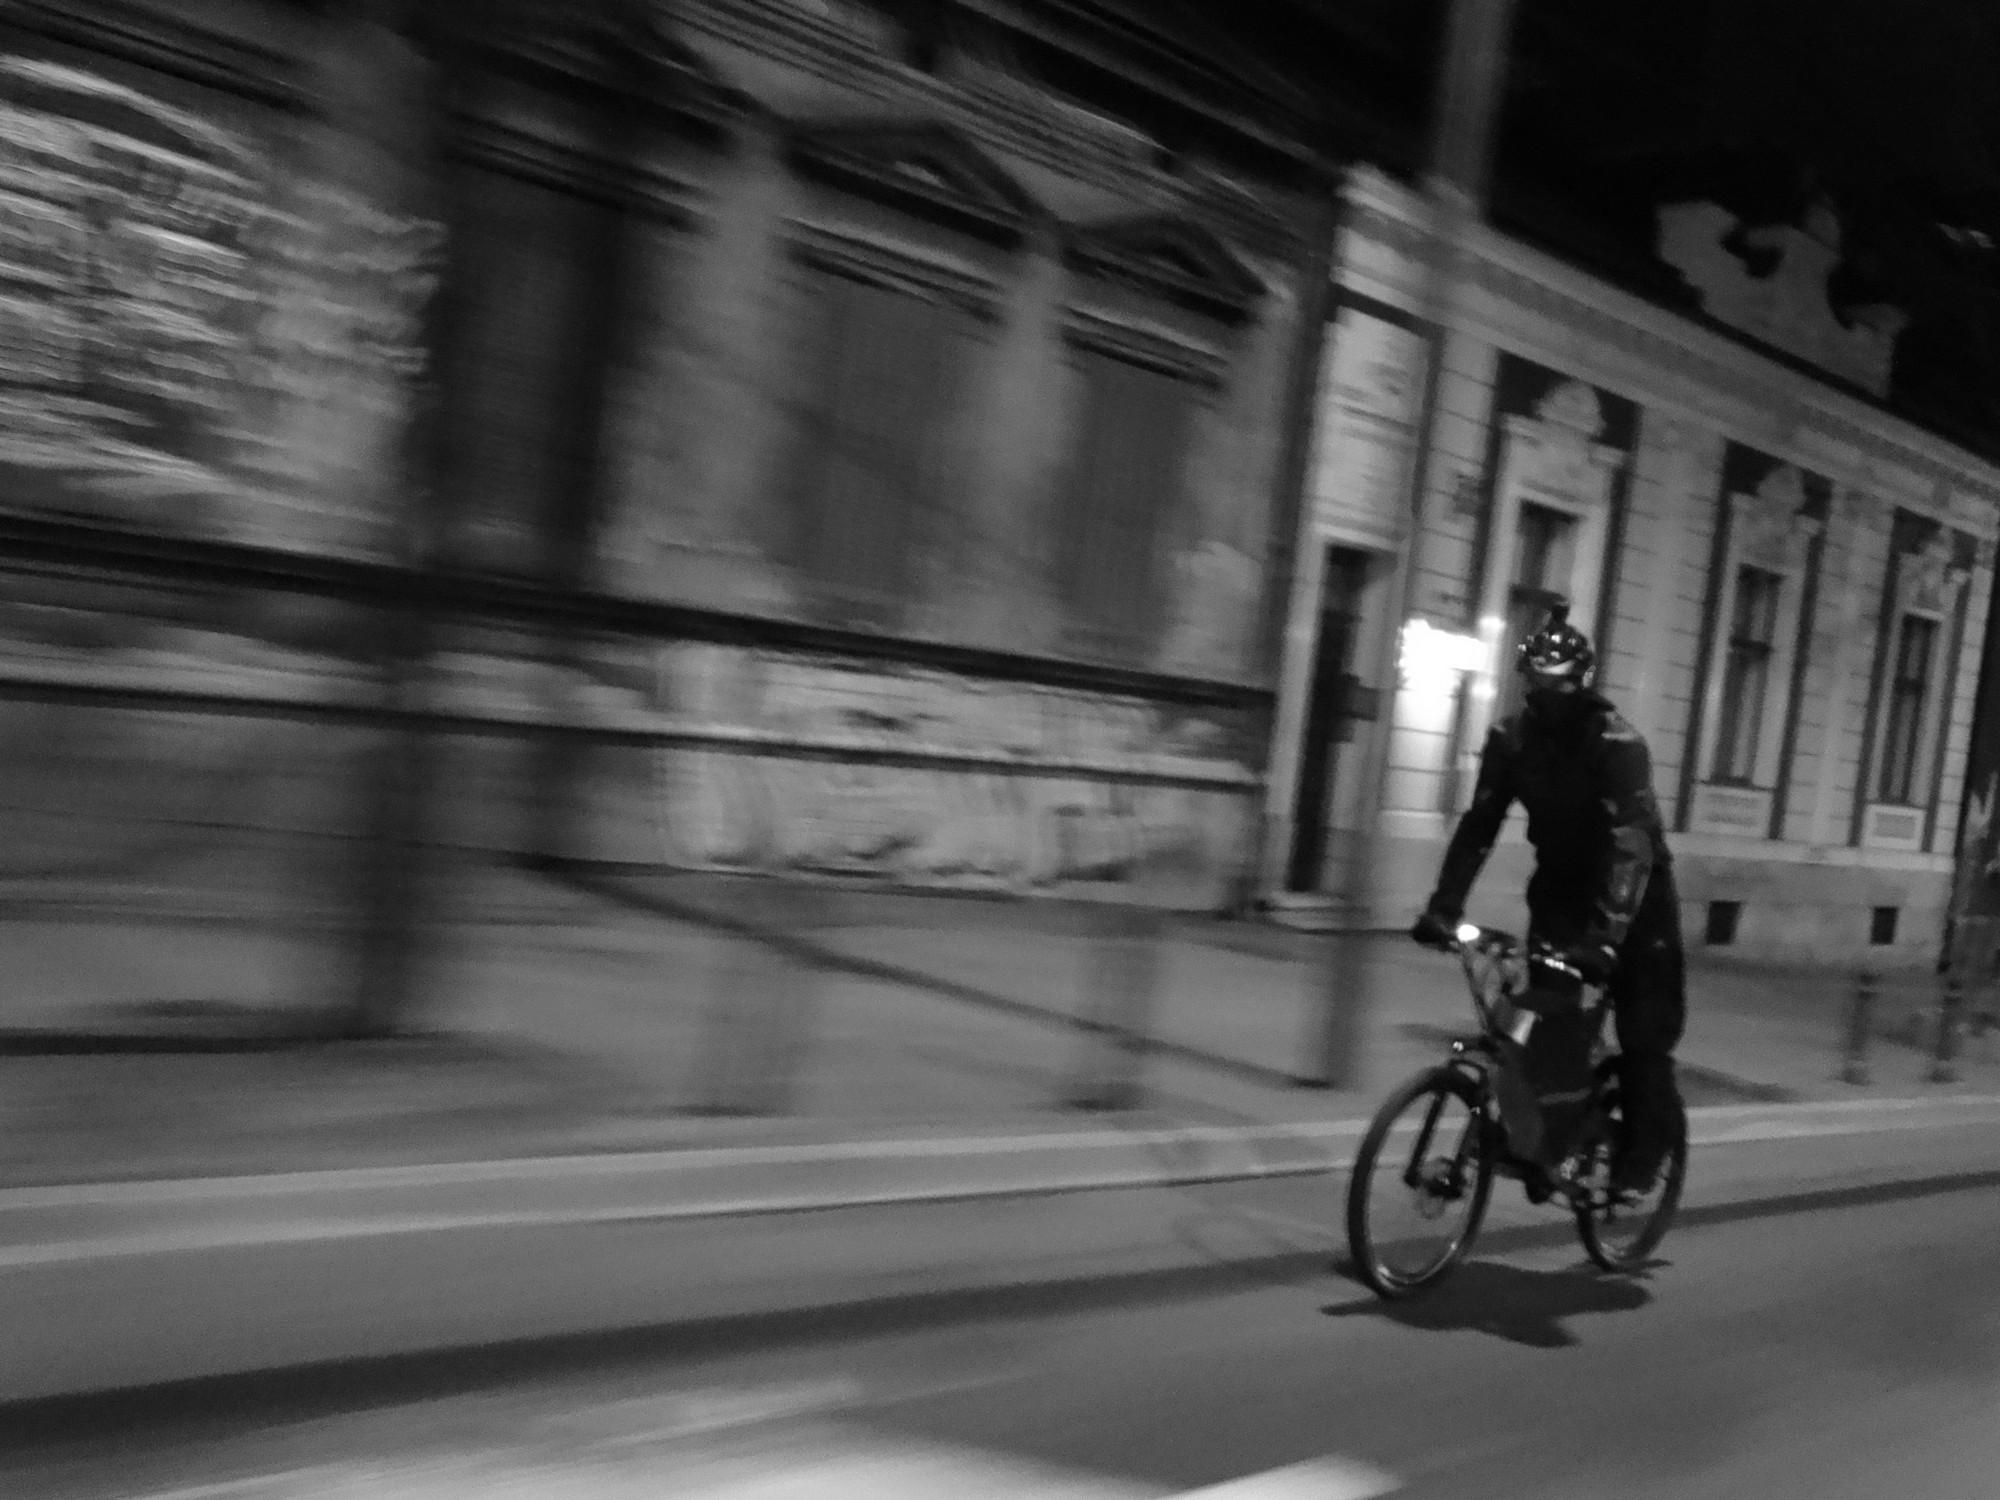 e-prime-electric-bicycle-autonovosti.me-6